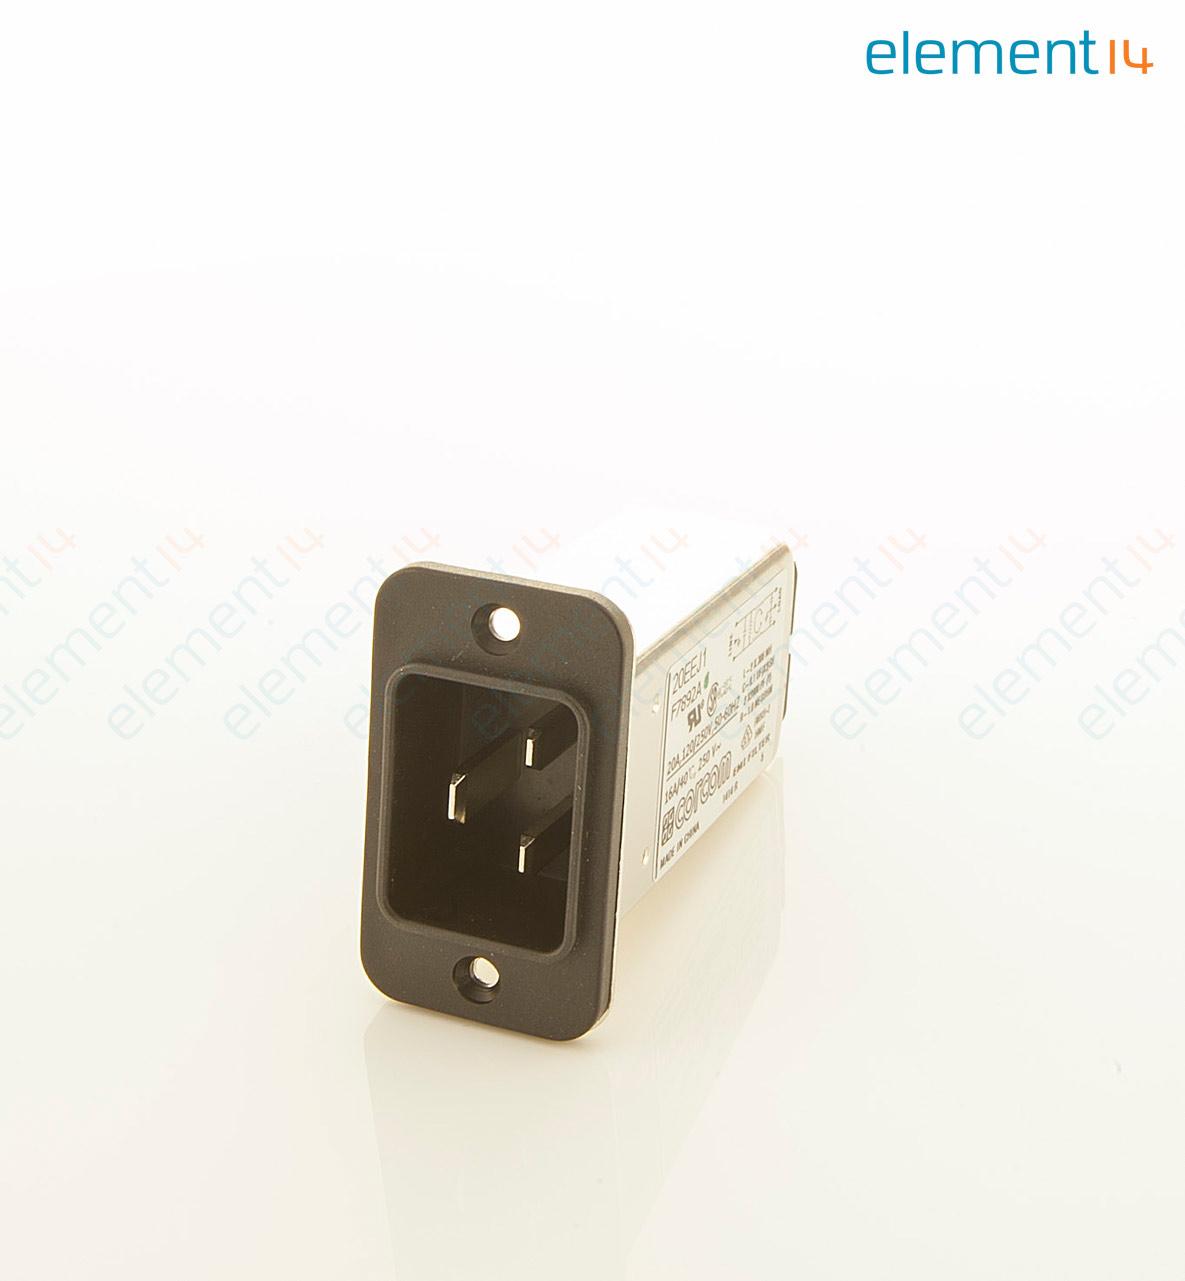 EMI New TE CONNECTIVITY  20EEJ1 IEC  Filter 250 VAC 20A 6609007-3 RFI